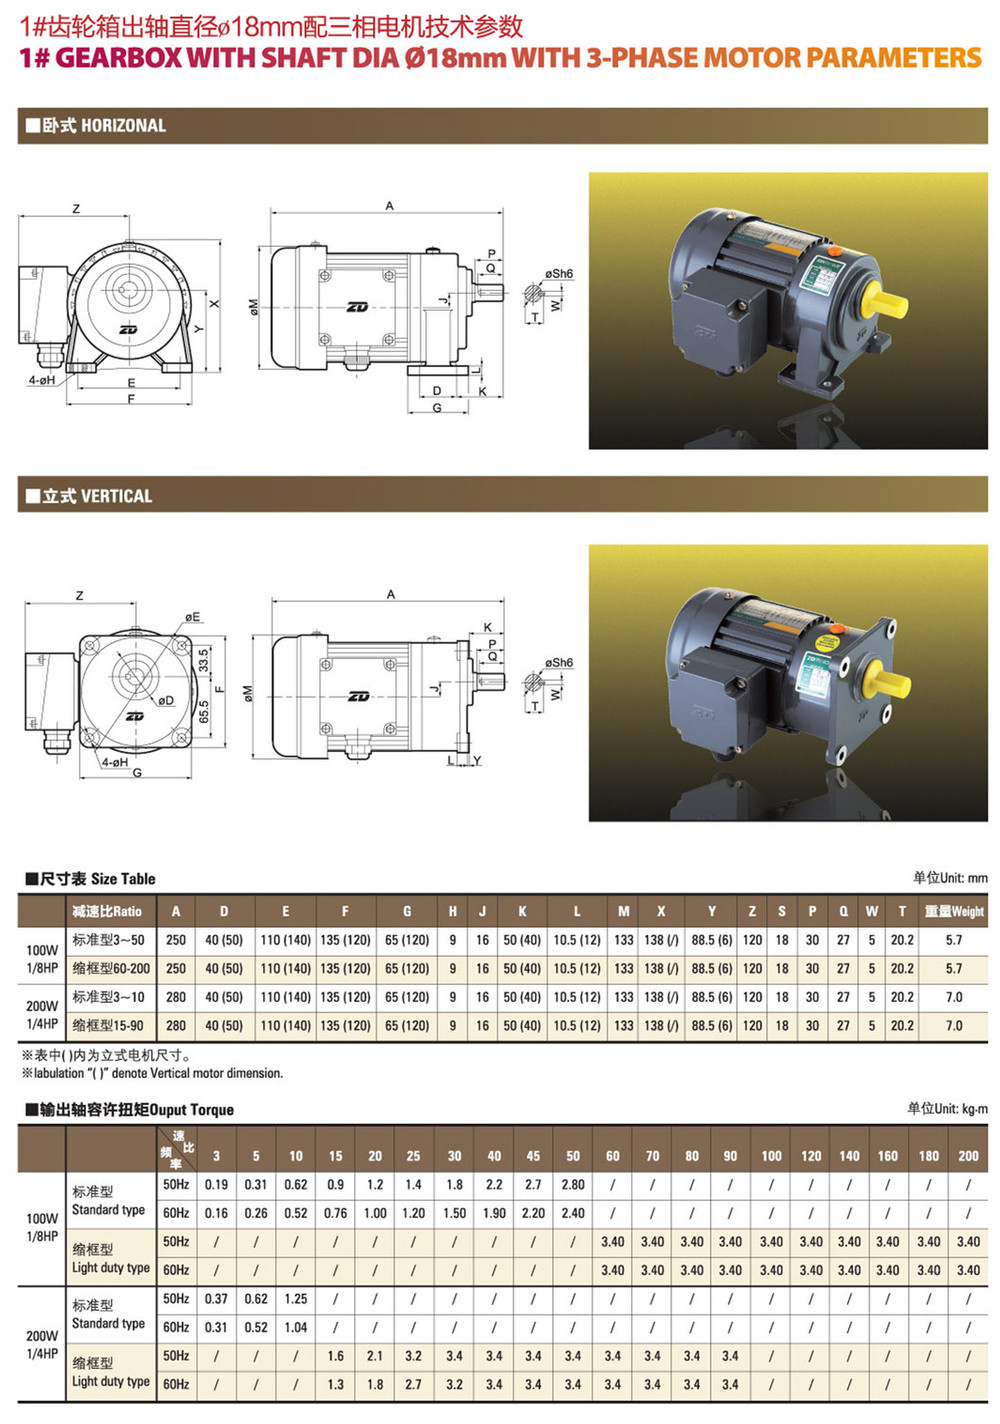 HTB1bfEvHXXXXXcJXXXXq6xXFXXXs - 200W motor with brake voltage 220 volts 1 phase shaft diameter 22mm output speed 90-100 turns reducer for the machine tool